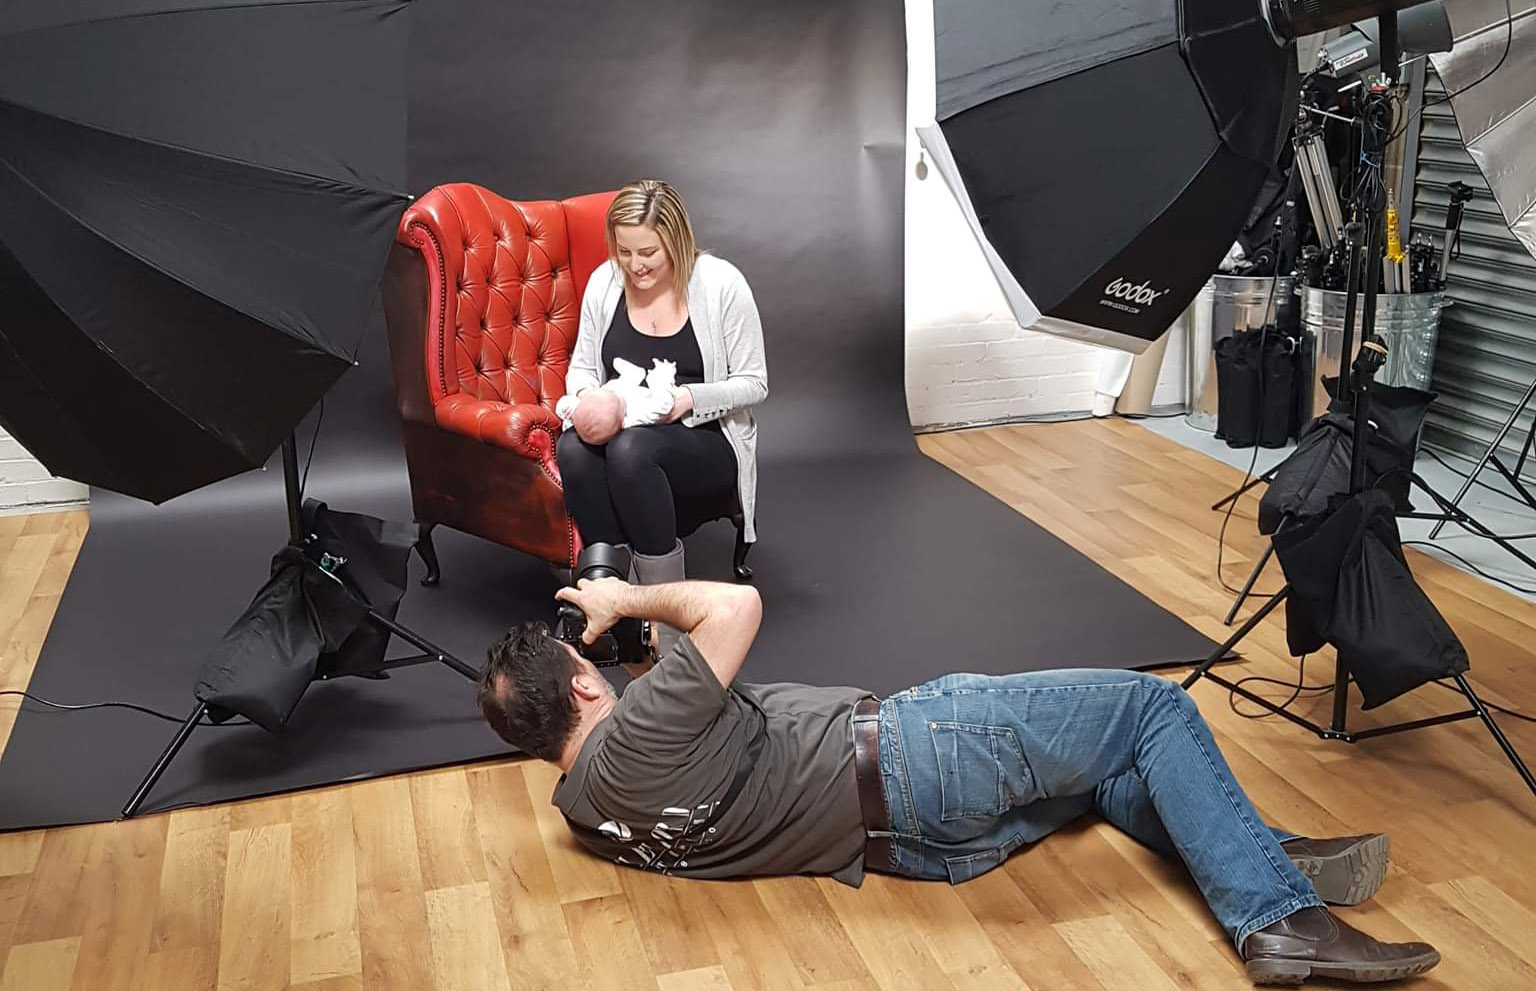 Thetford Photography Founder Norfolk Photographer